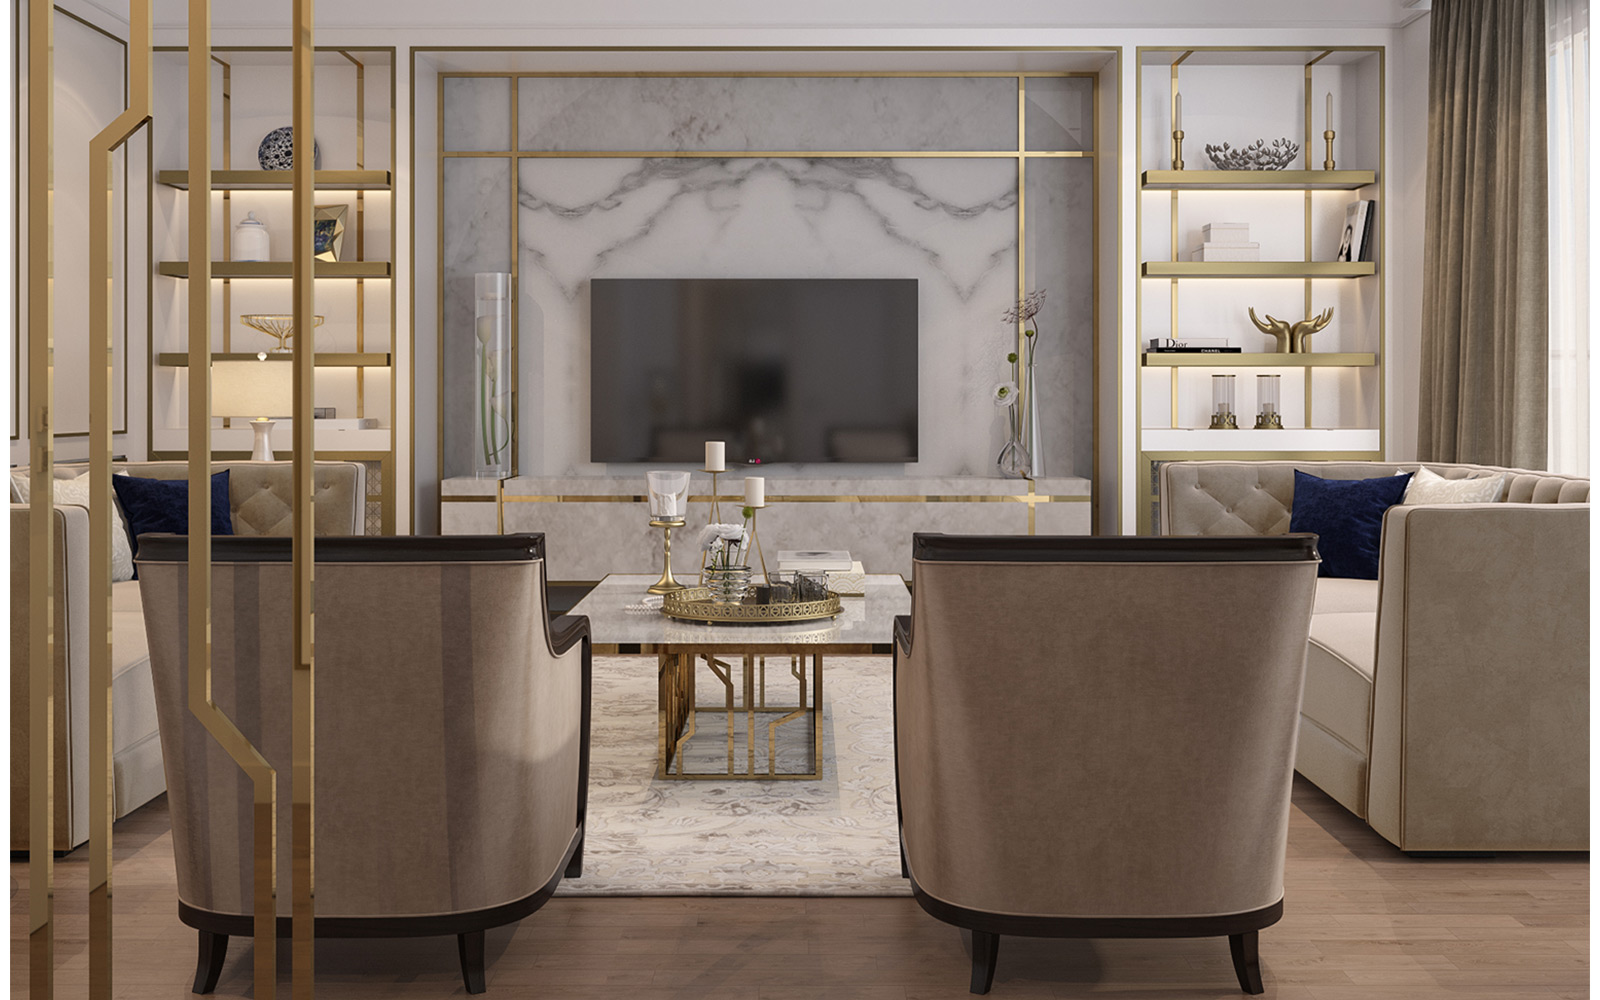 Vogue Design - Istanbul Yeni Moda Flat6